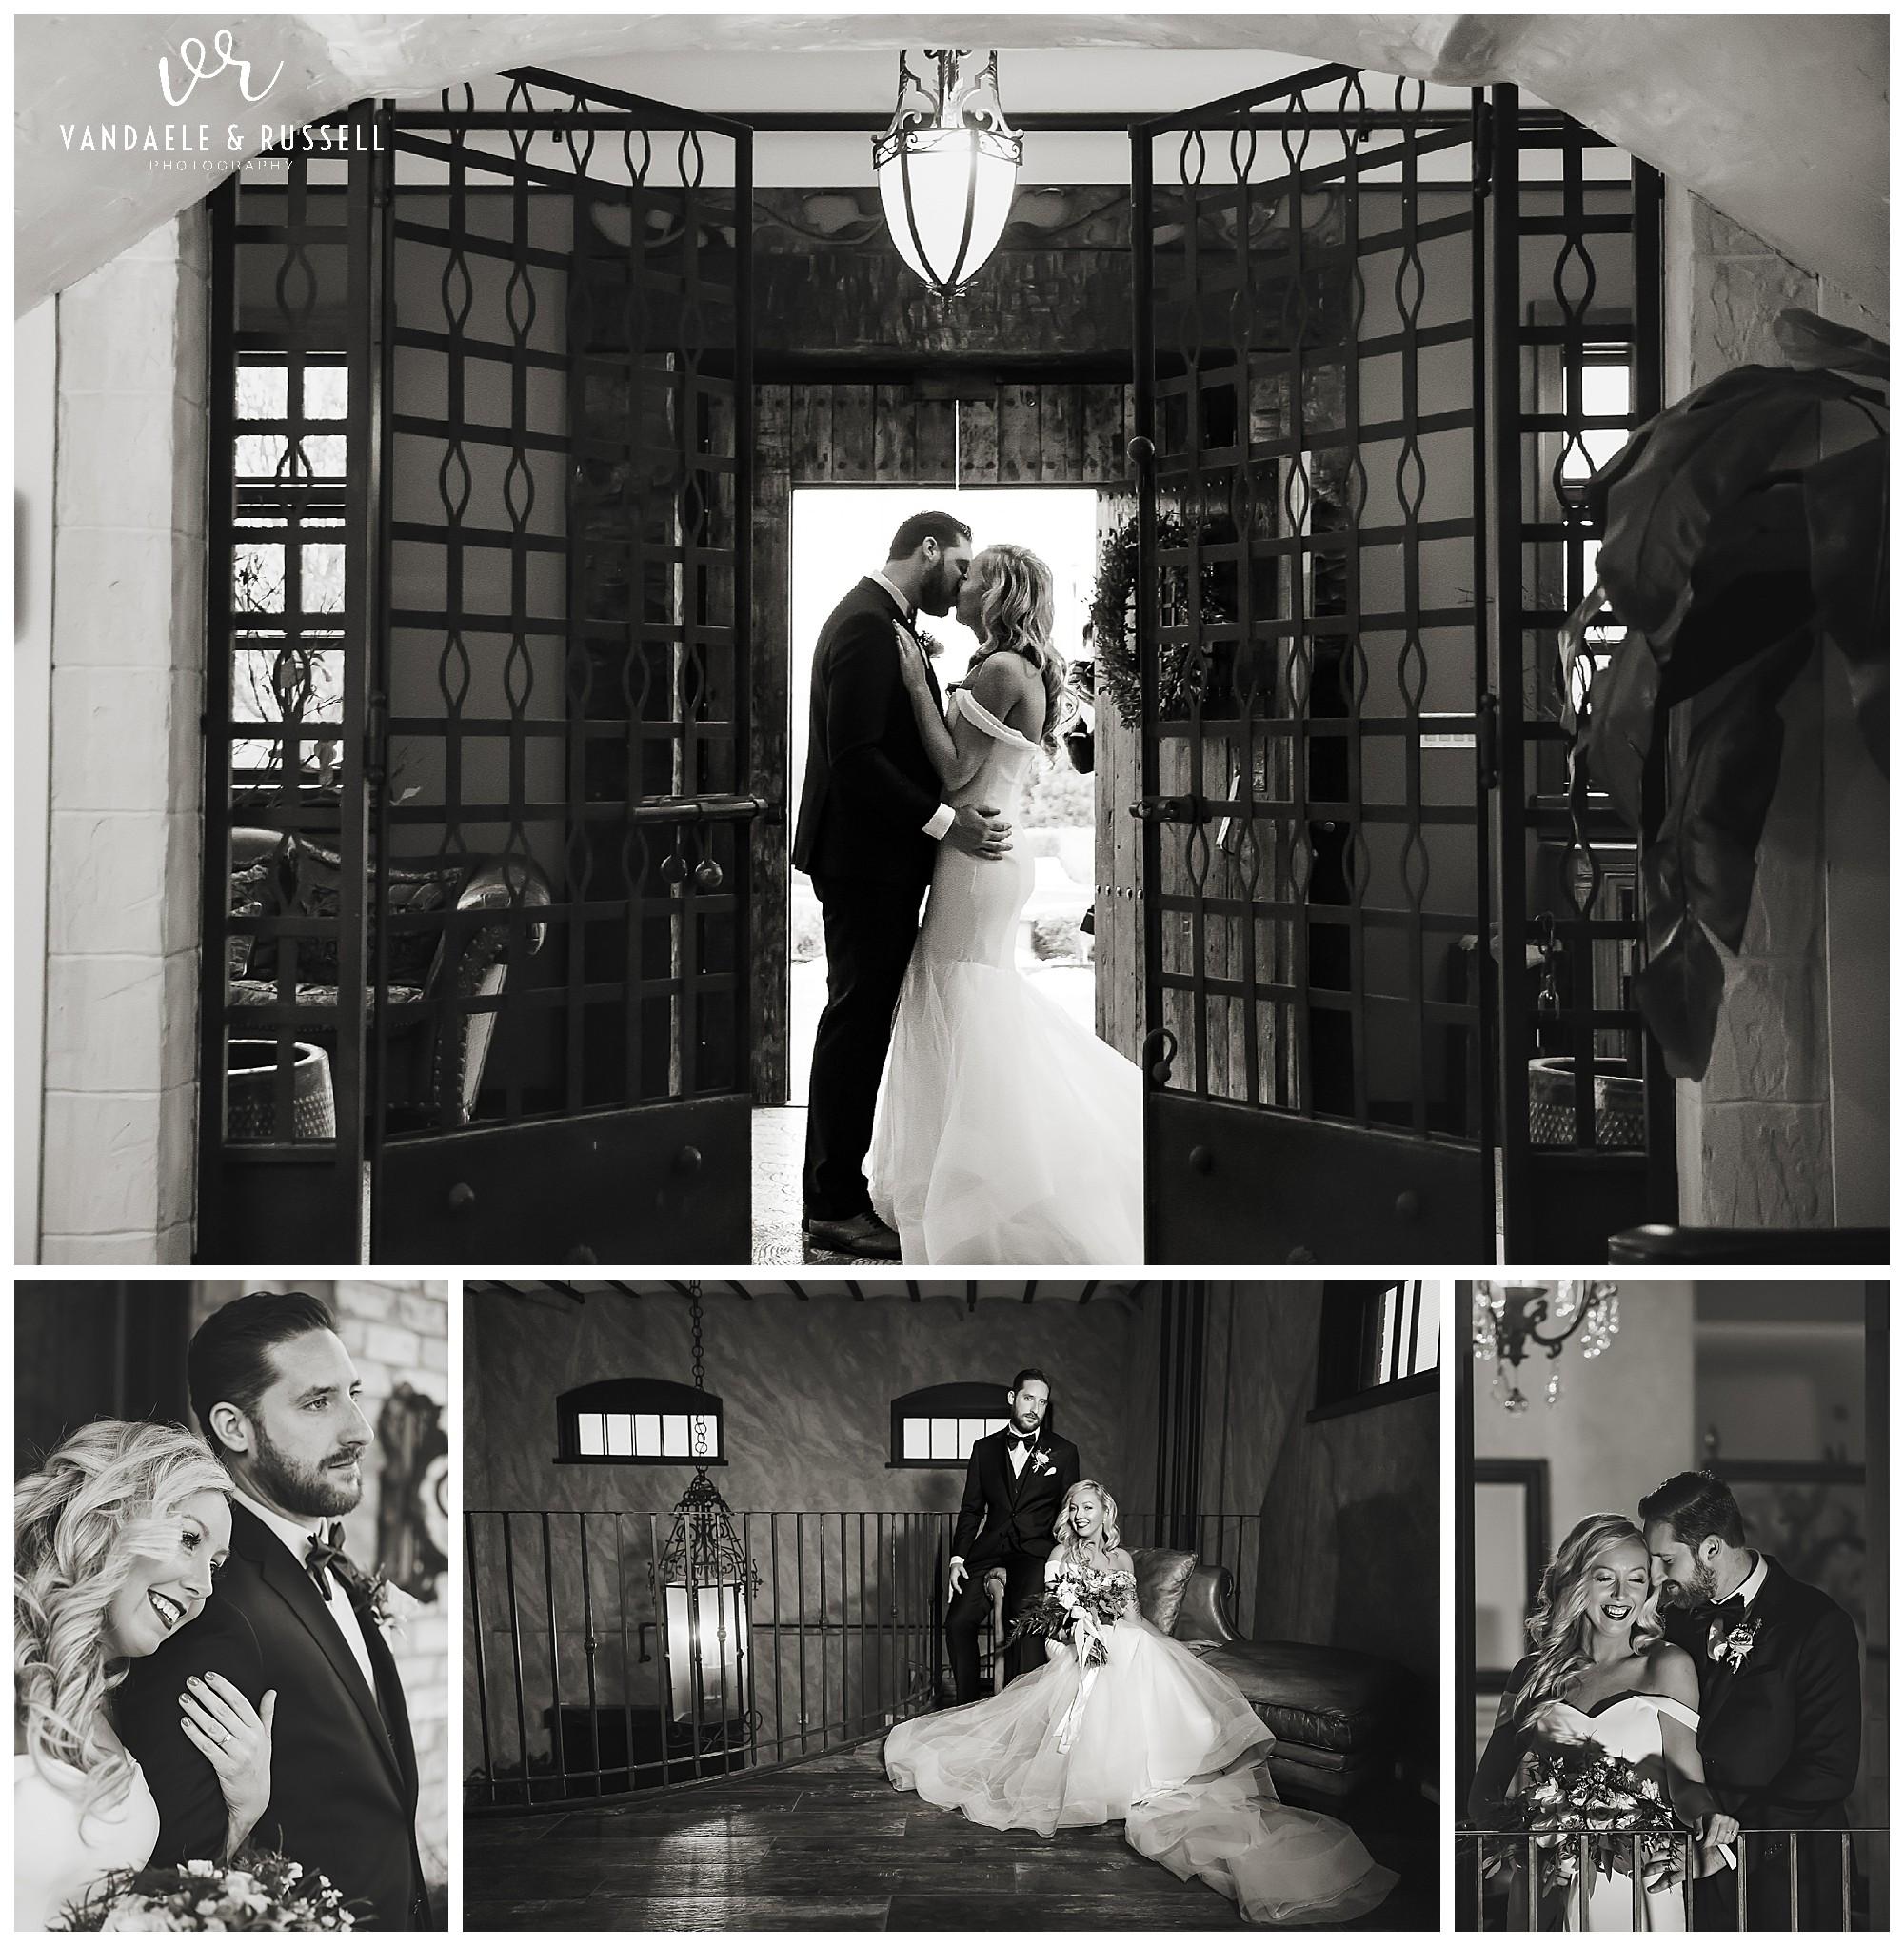 Hacienda-Sarria-Wedding-Photos-NYE-Michelle-Matt-VanDaele-Russell_0026.jpg